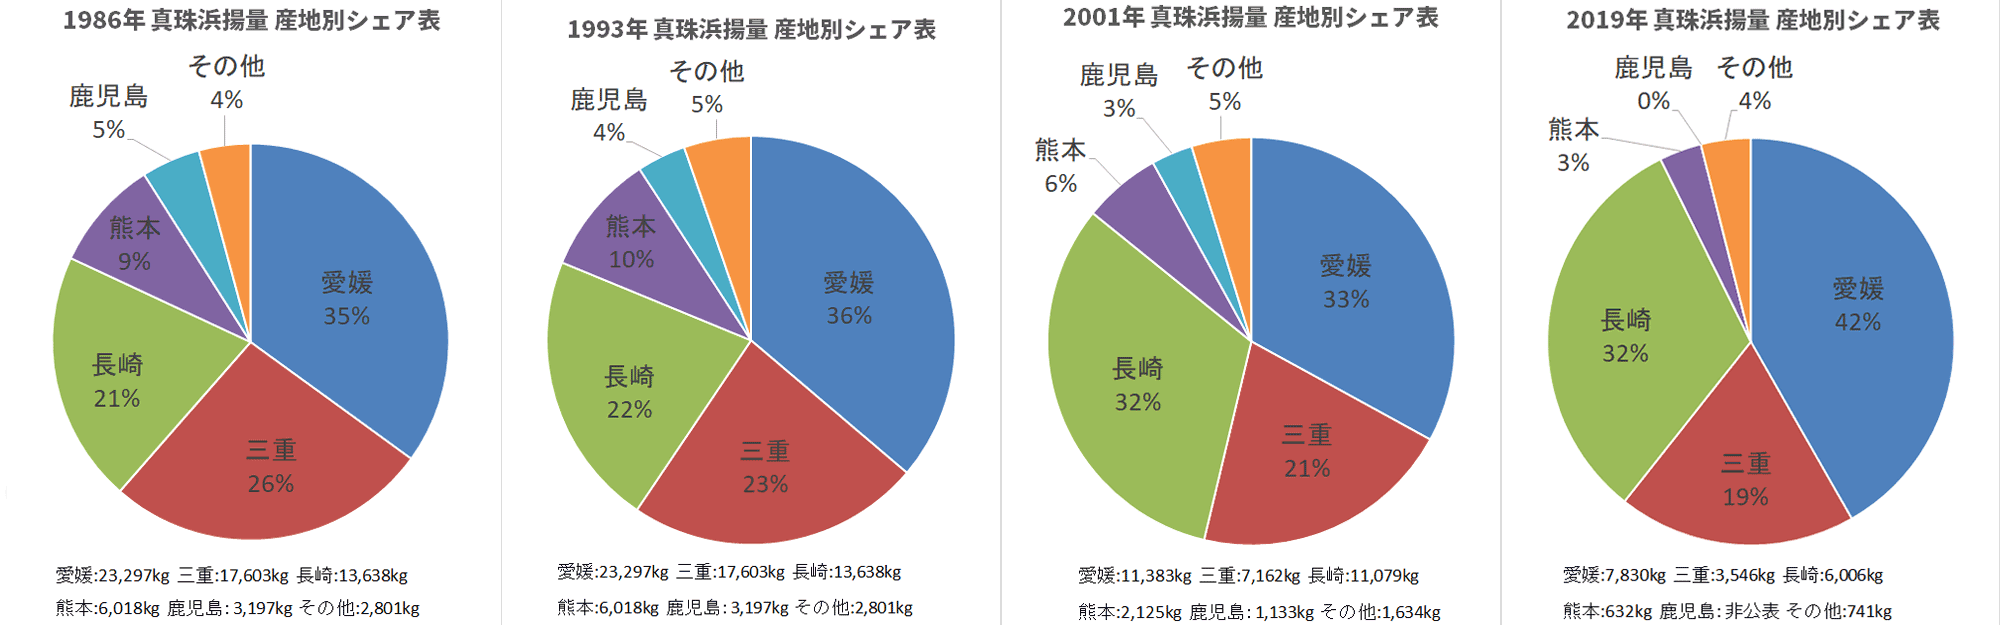 1986年度1993年度2001年度2019年度都道府県別真珠浜揚量シェアグラフ